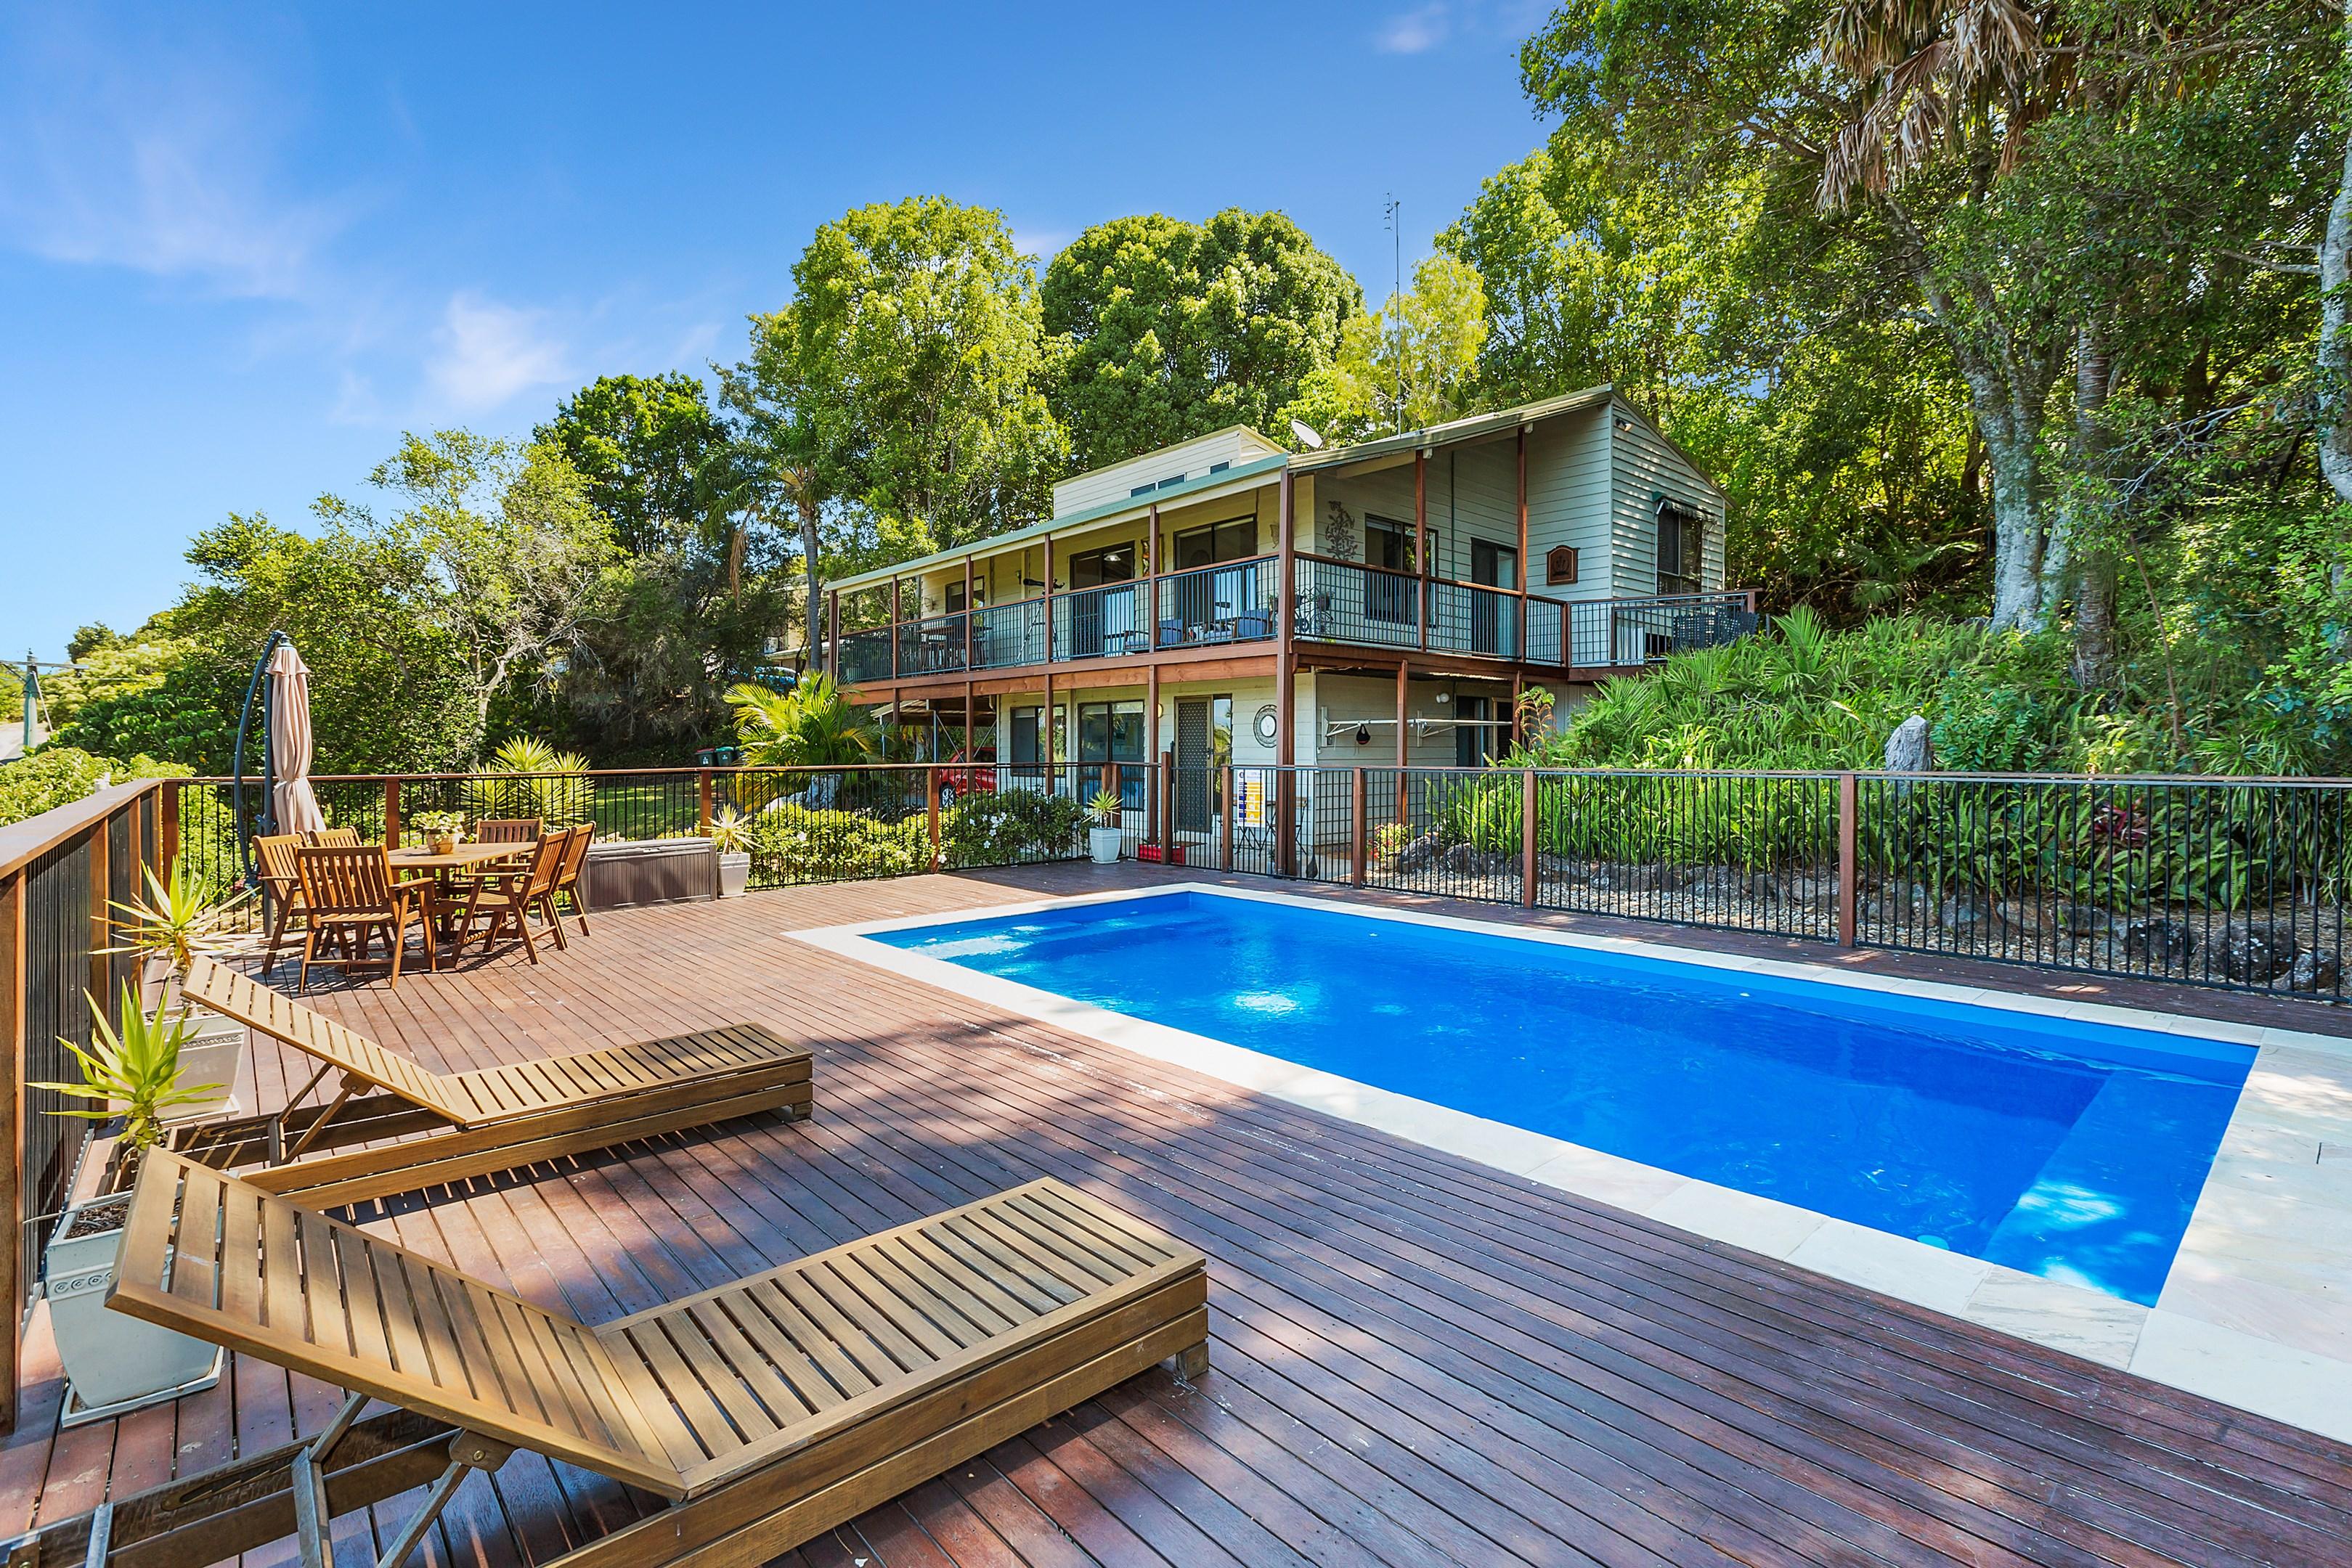 22 banora terrace bilambil heights nsw 2486 house for sale rh domain com au